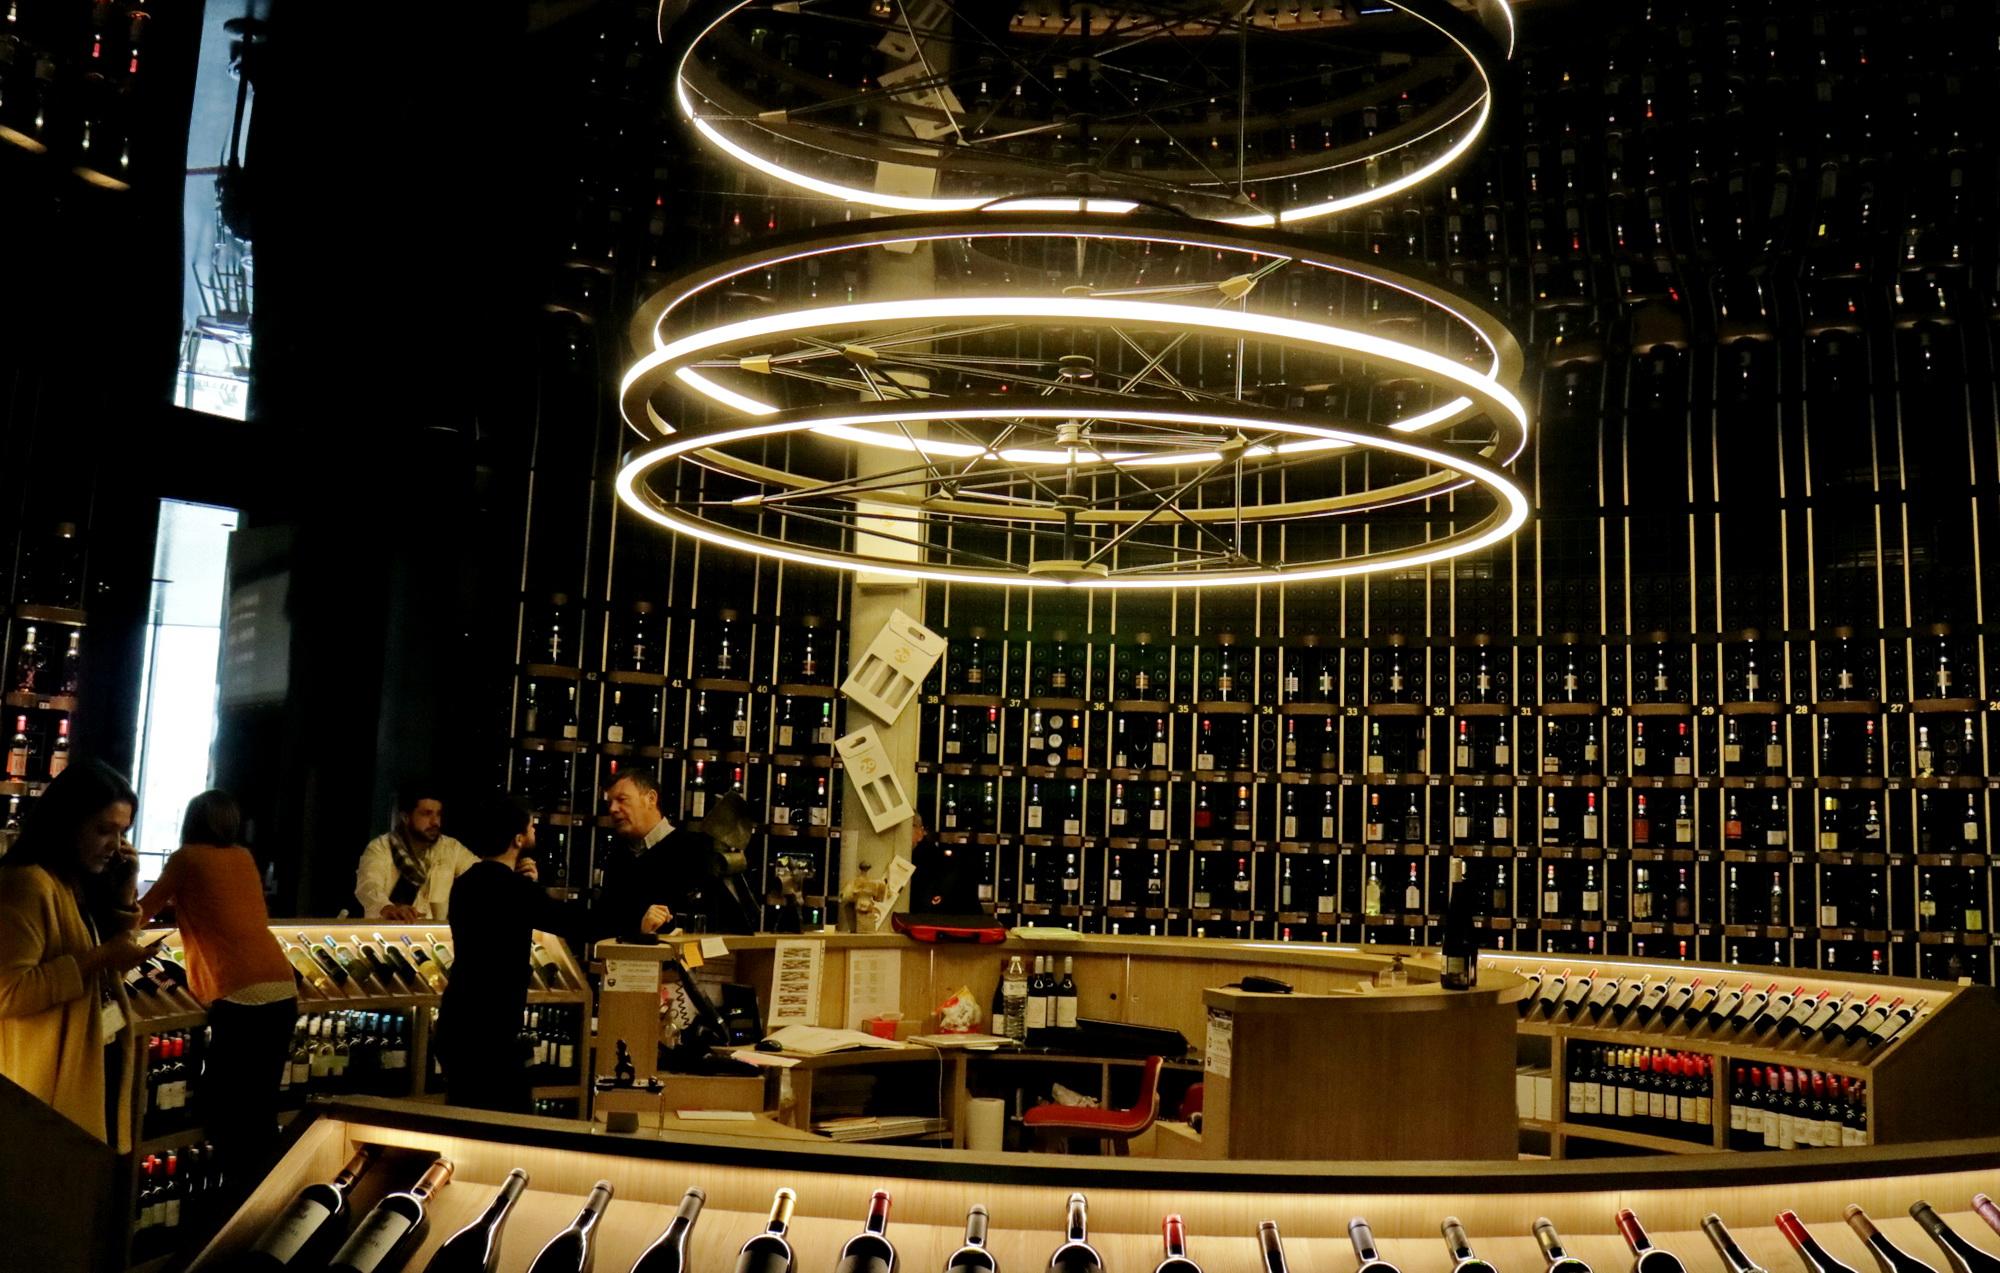 Sretan 1. rođendan Gradu vina!